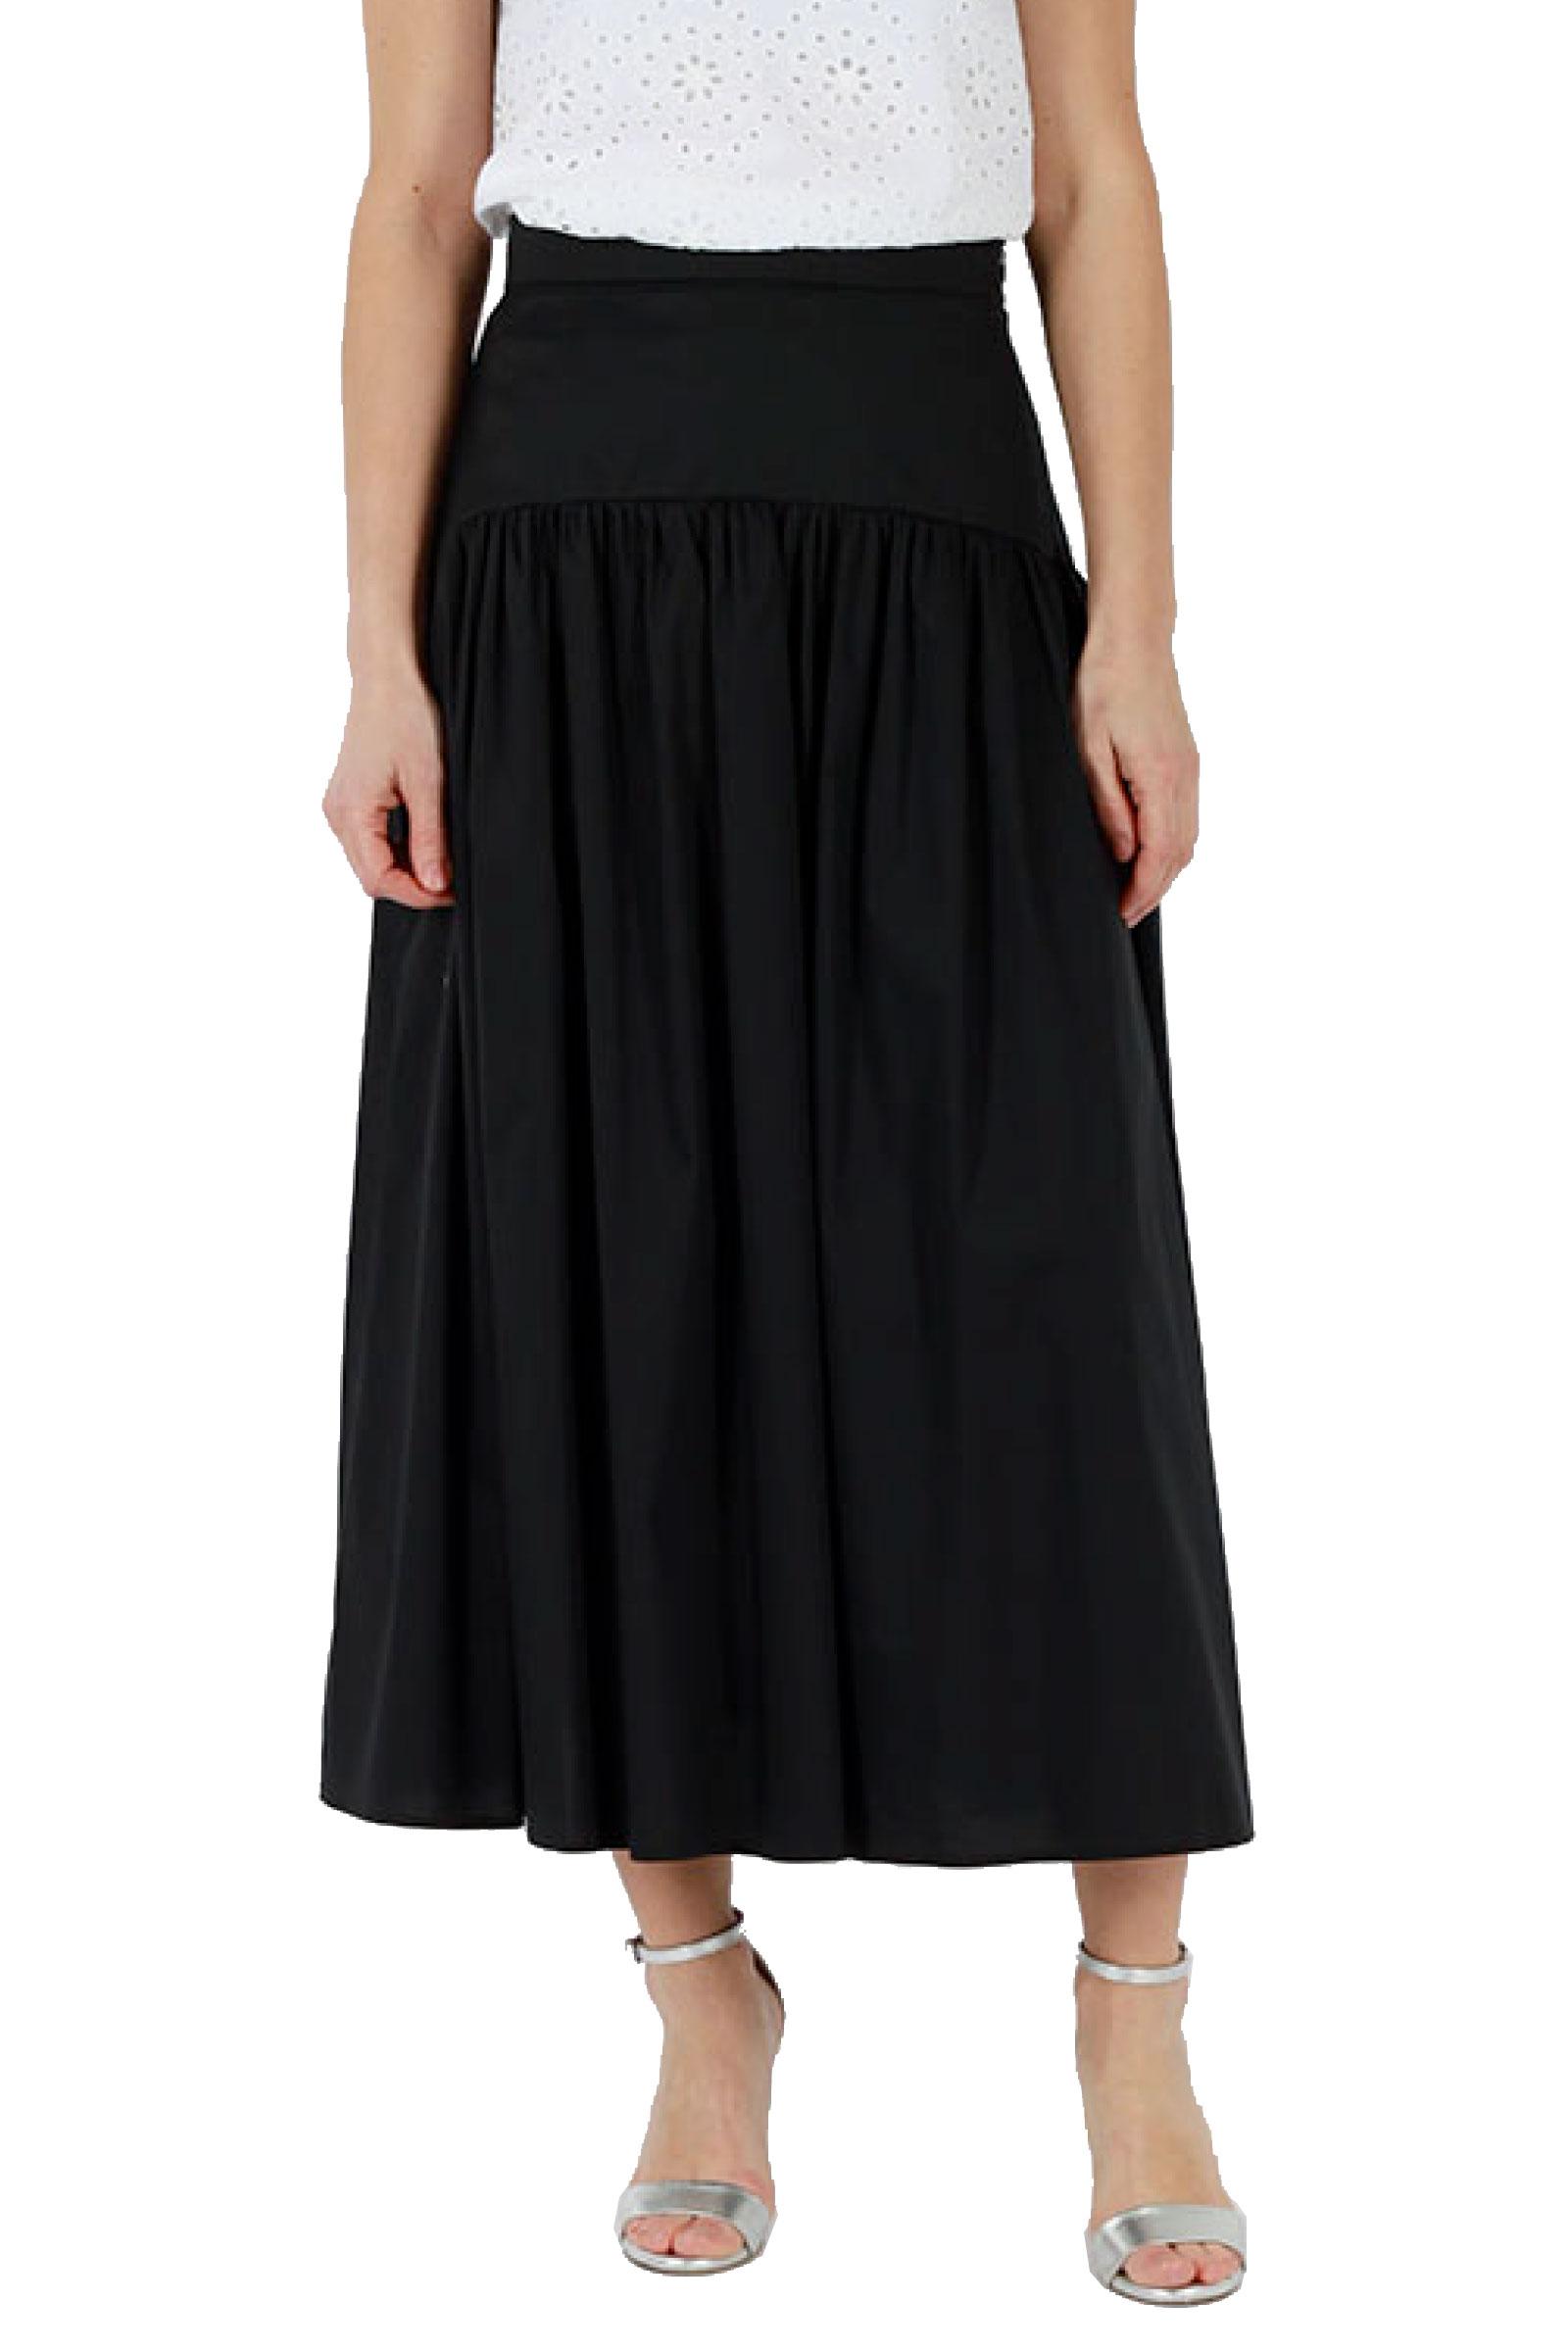 EMME MARELLA | Skirt | 51010114000004